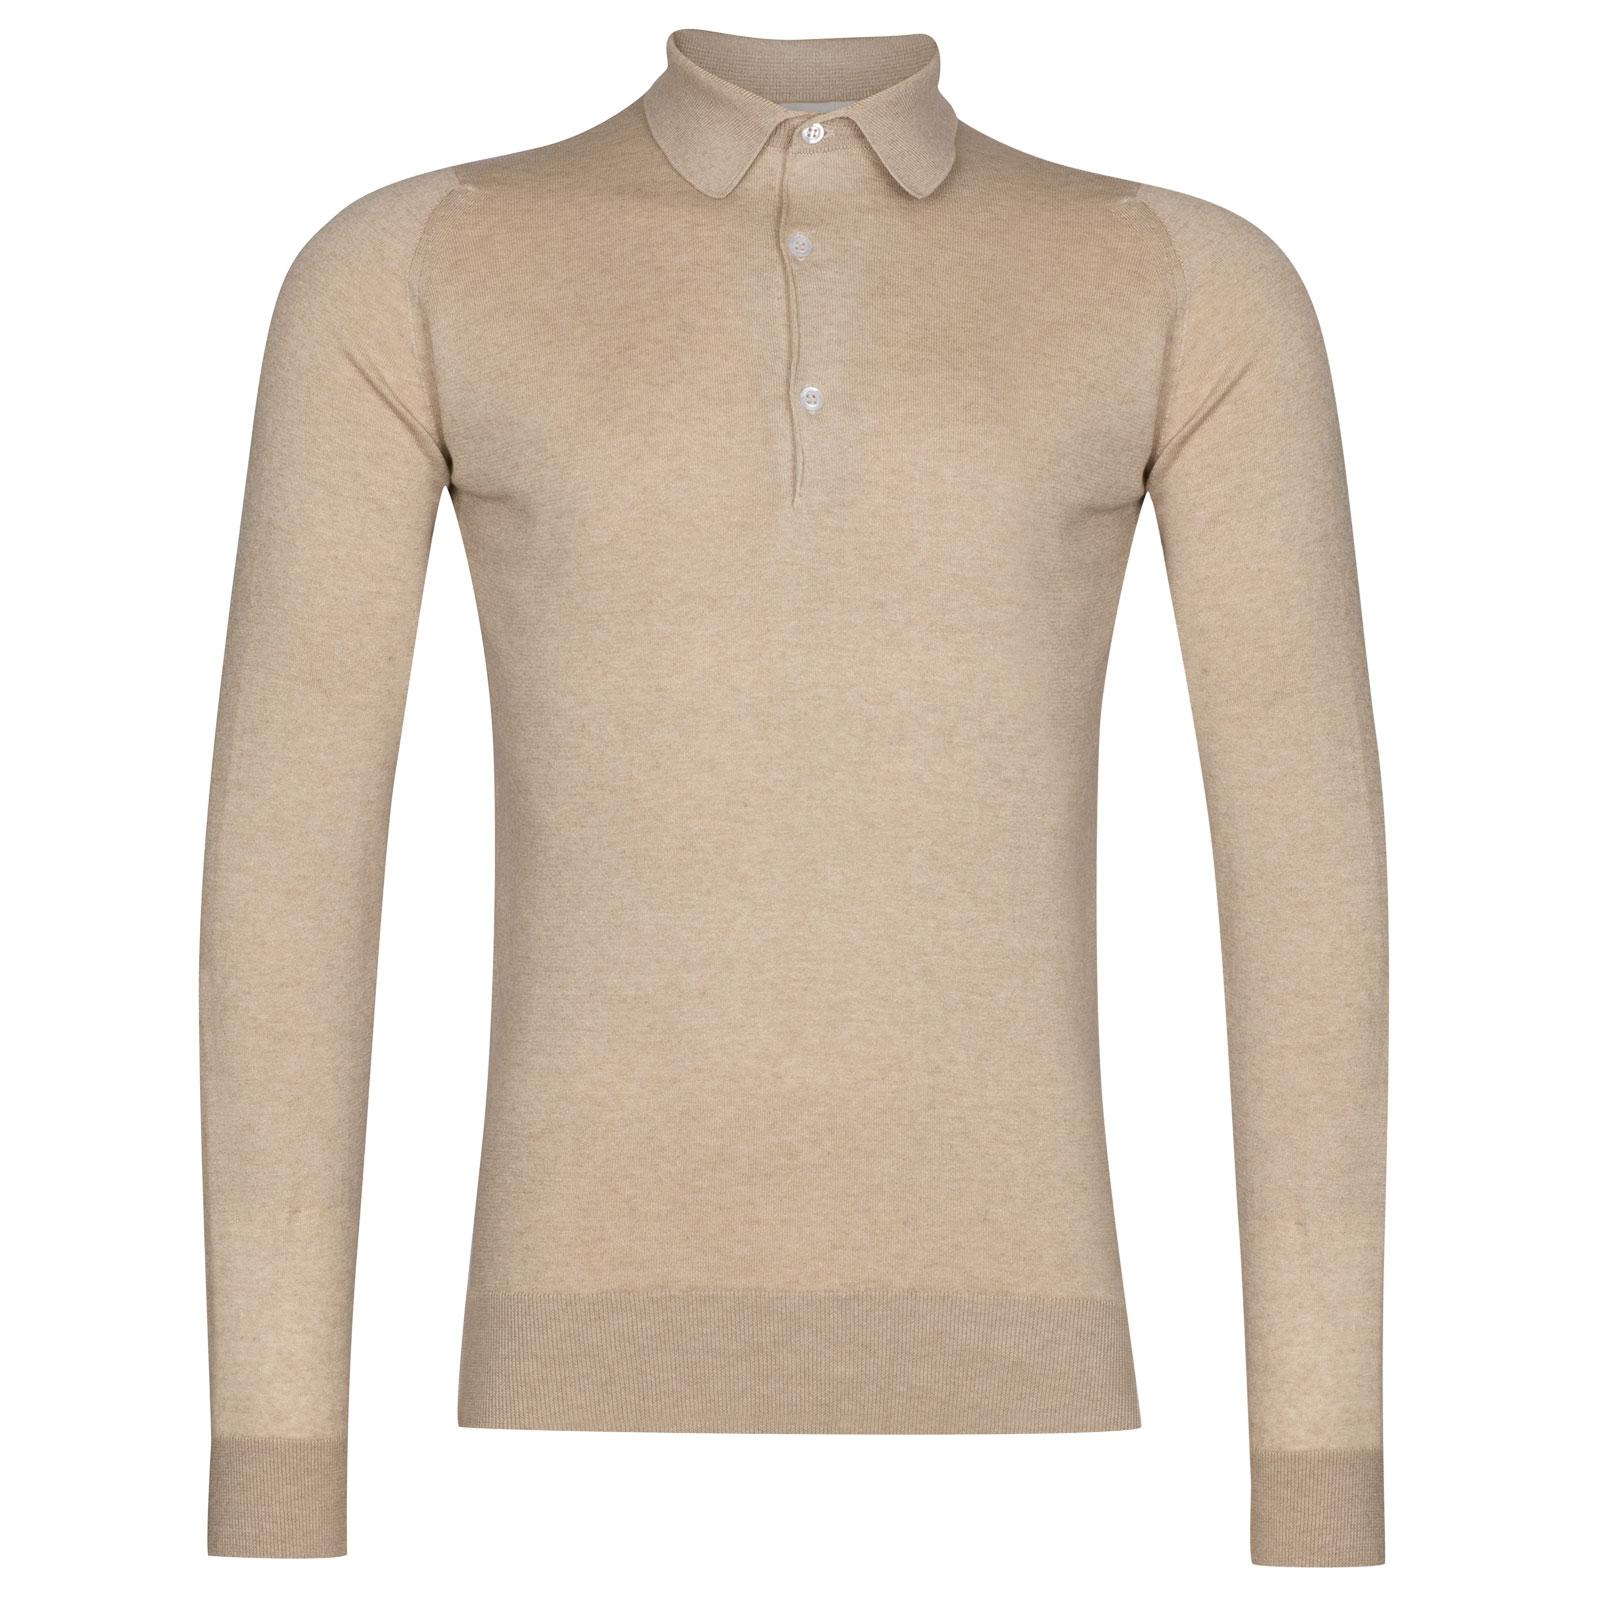 John Smedley Lanlay in Sandstone Shirt-XLG